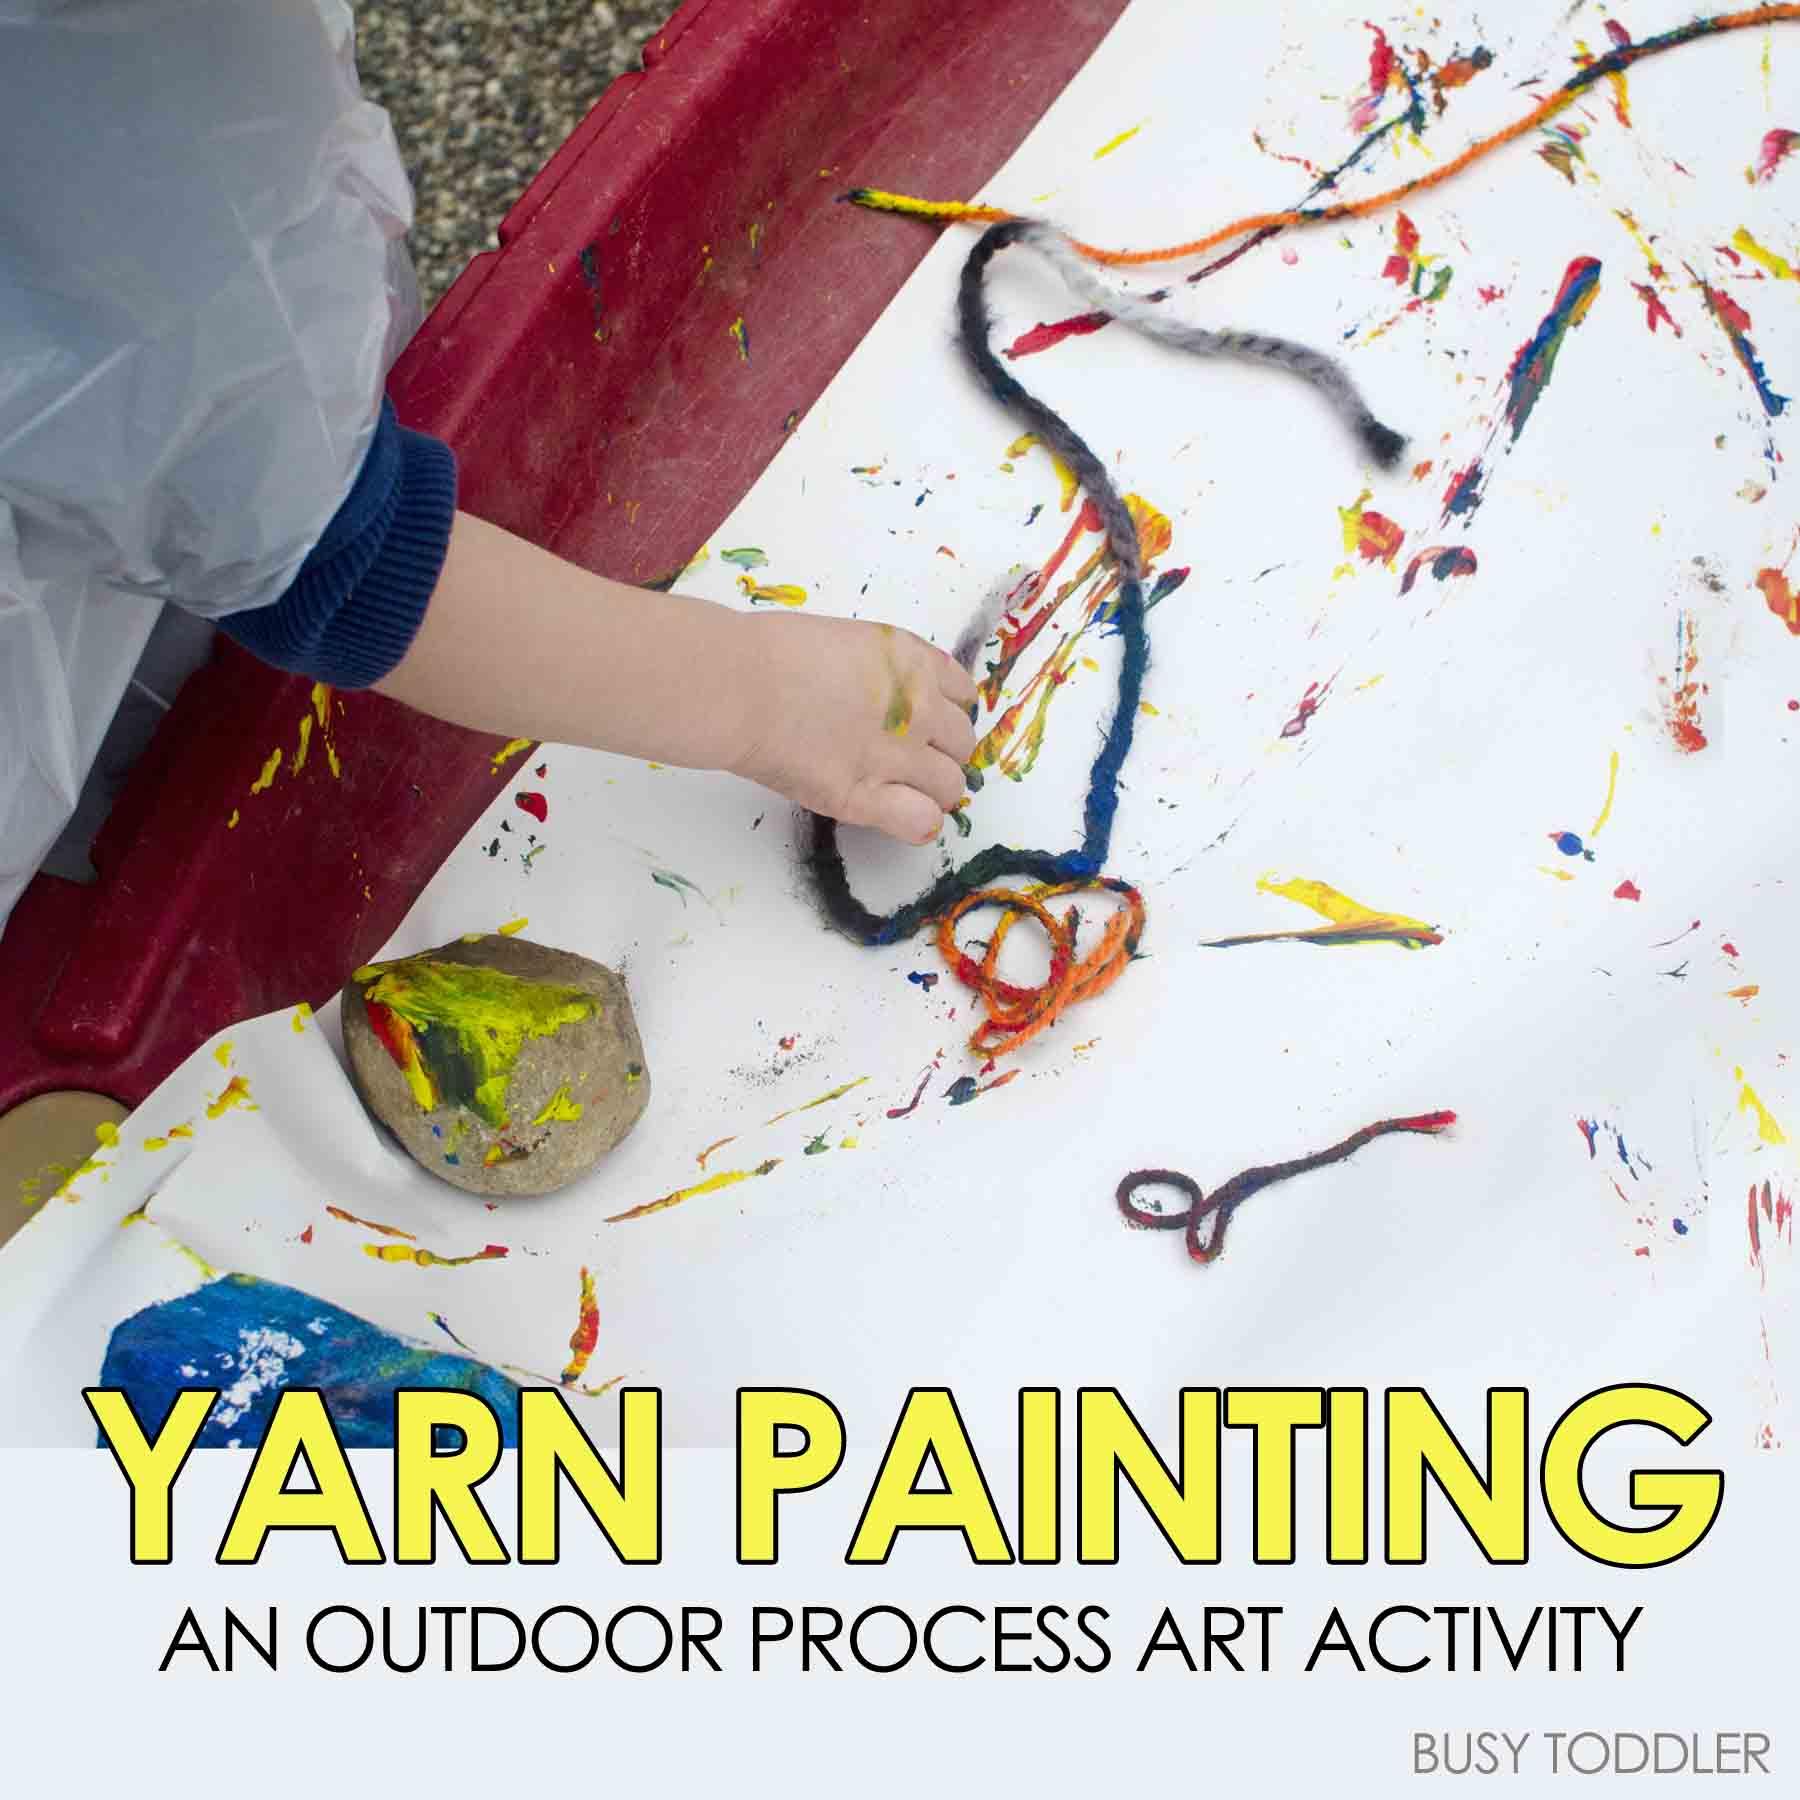 Yarn Painting Outdoor Process Art